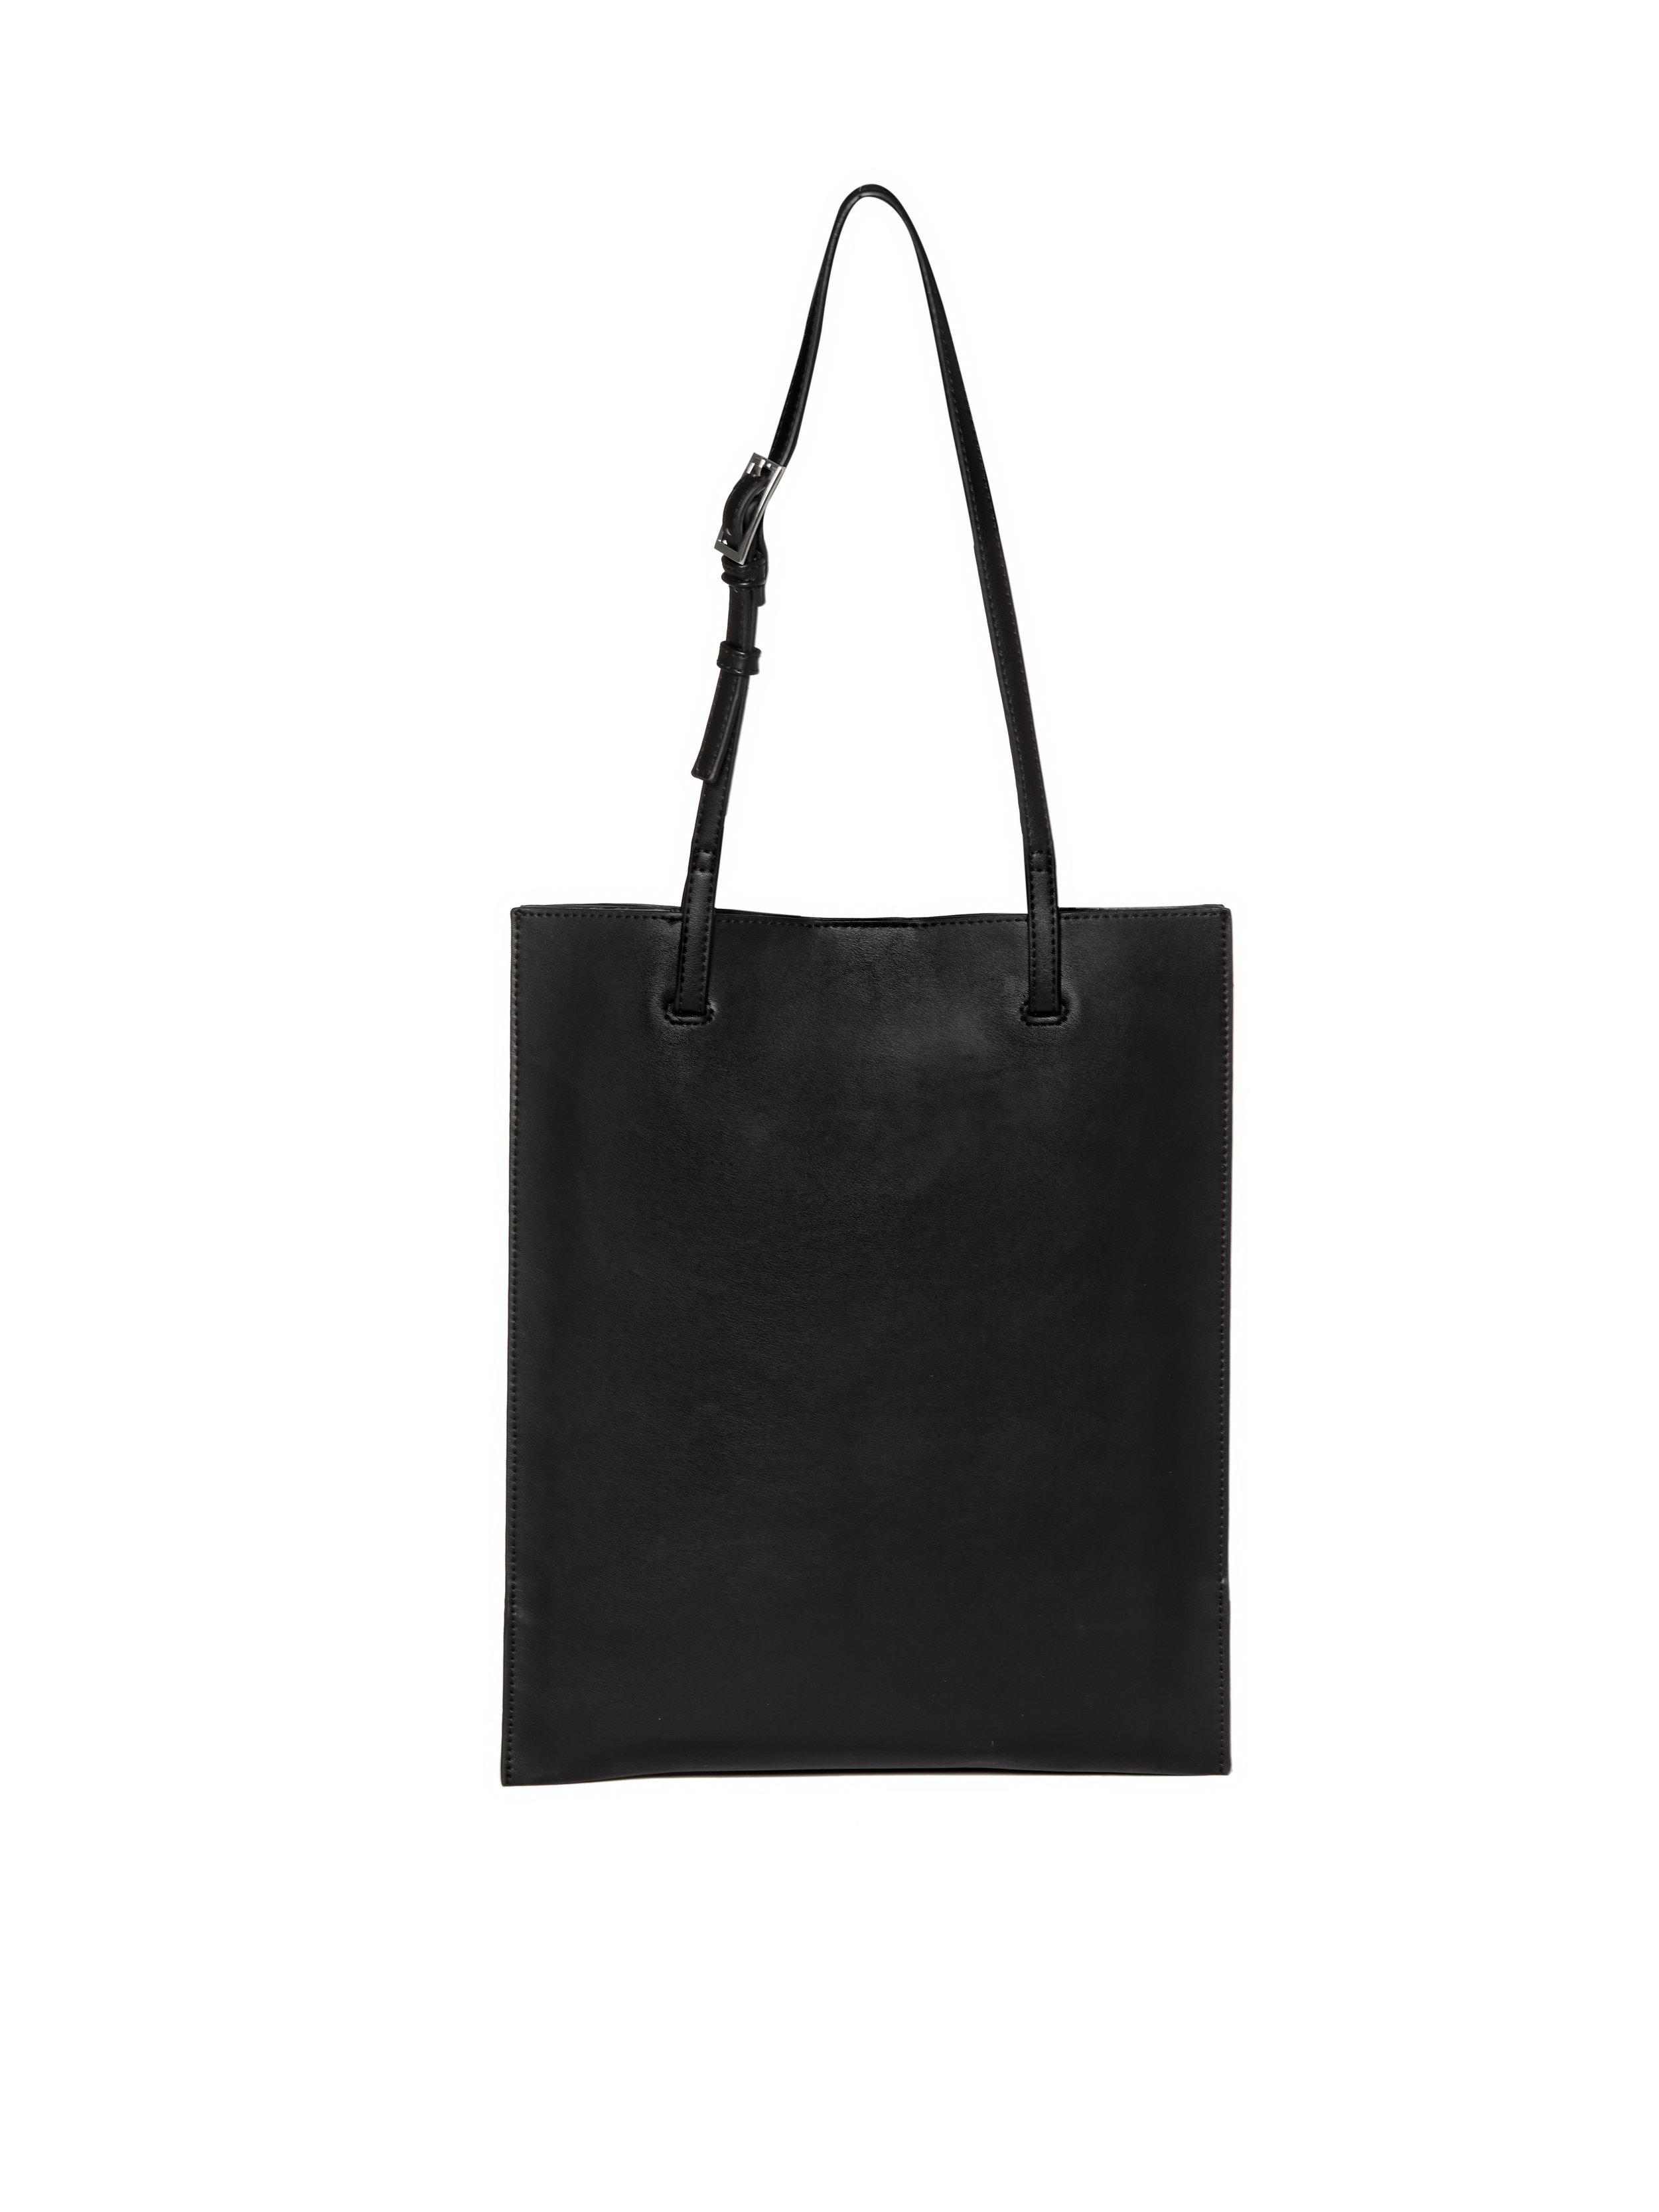 Lanka Tote Bag_1.jpg